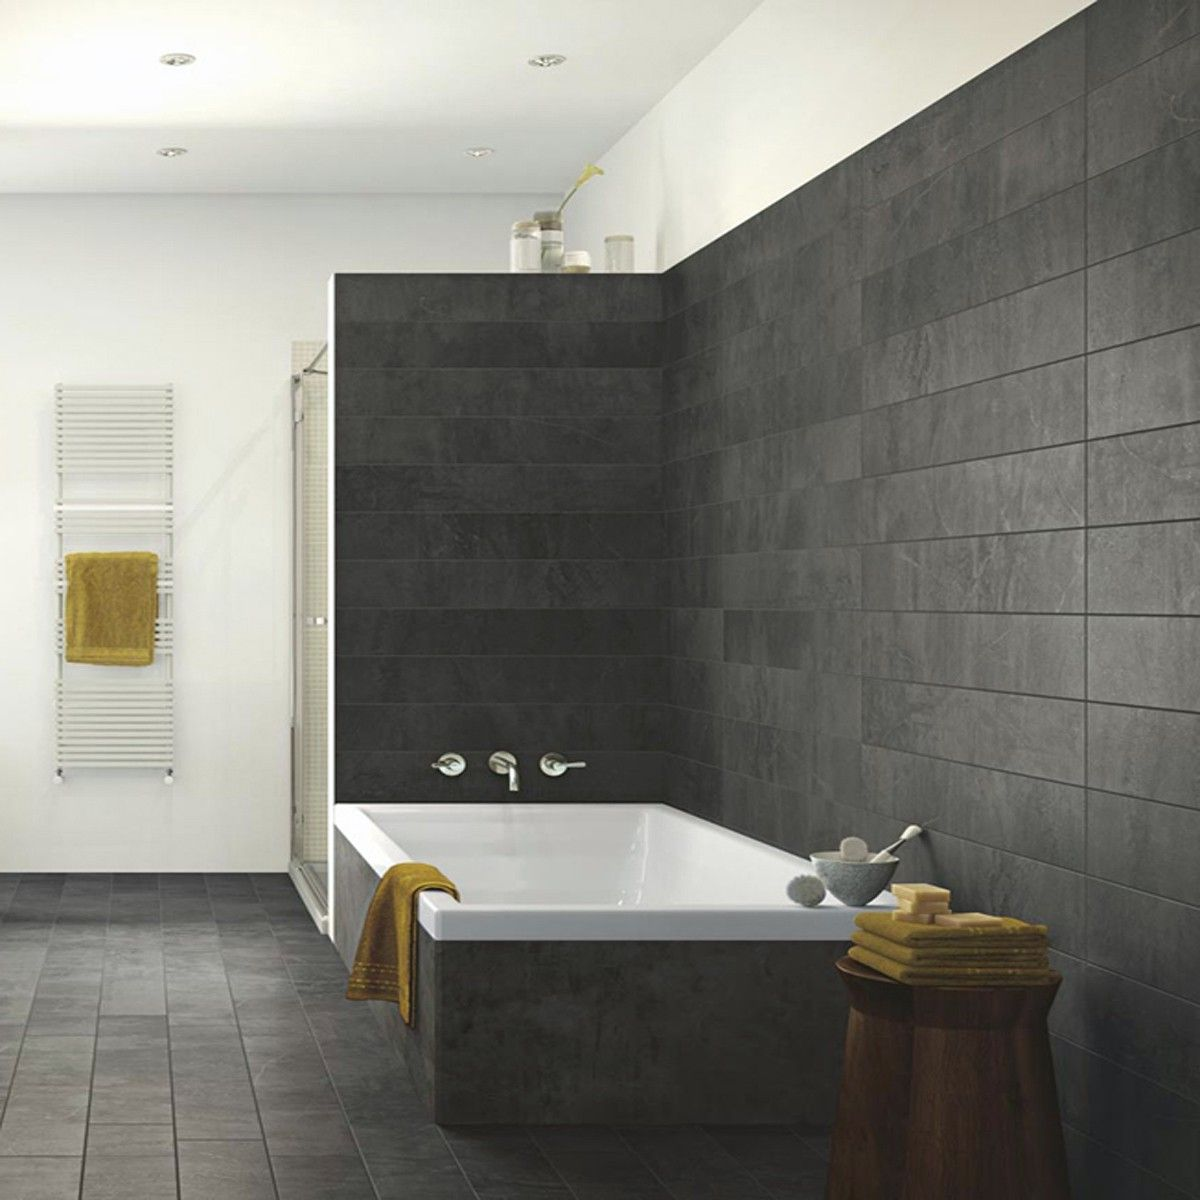 90x15 Milestone Antracite Matt Wood Effect Tiles Tile Floor Tiles Wood Effect Tiles